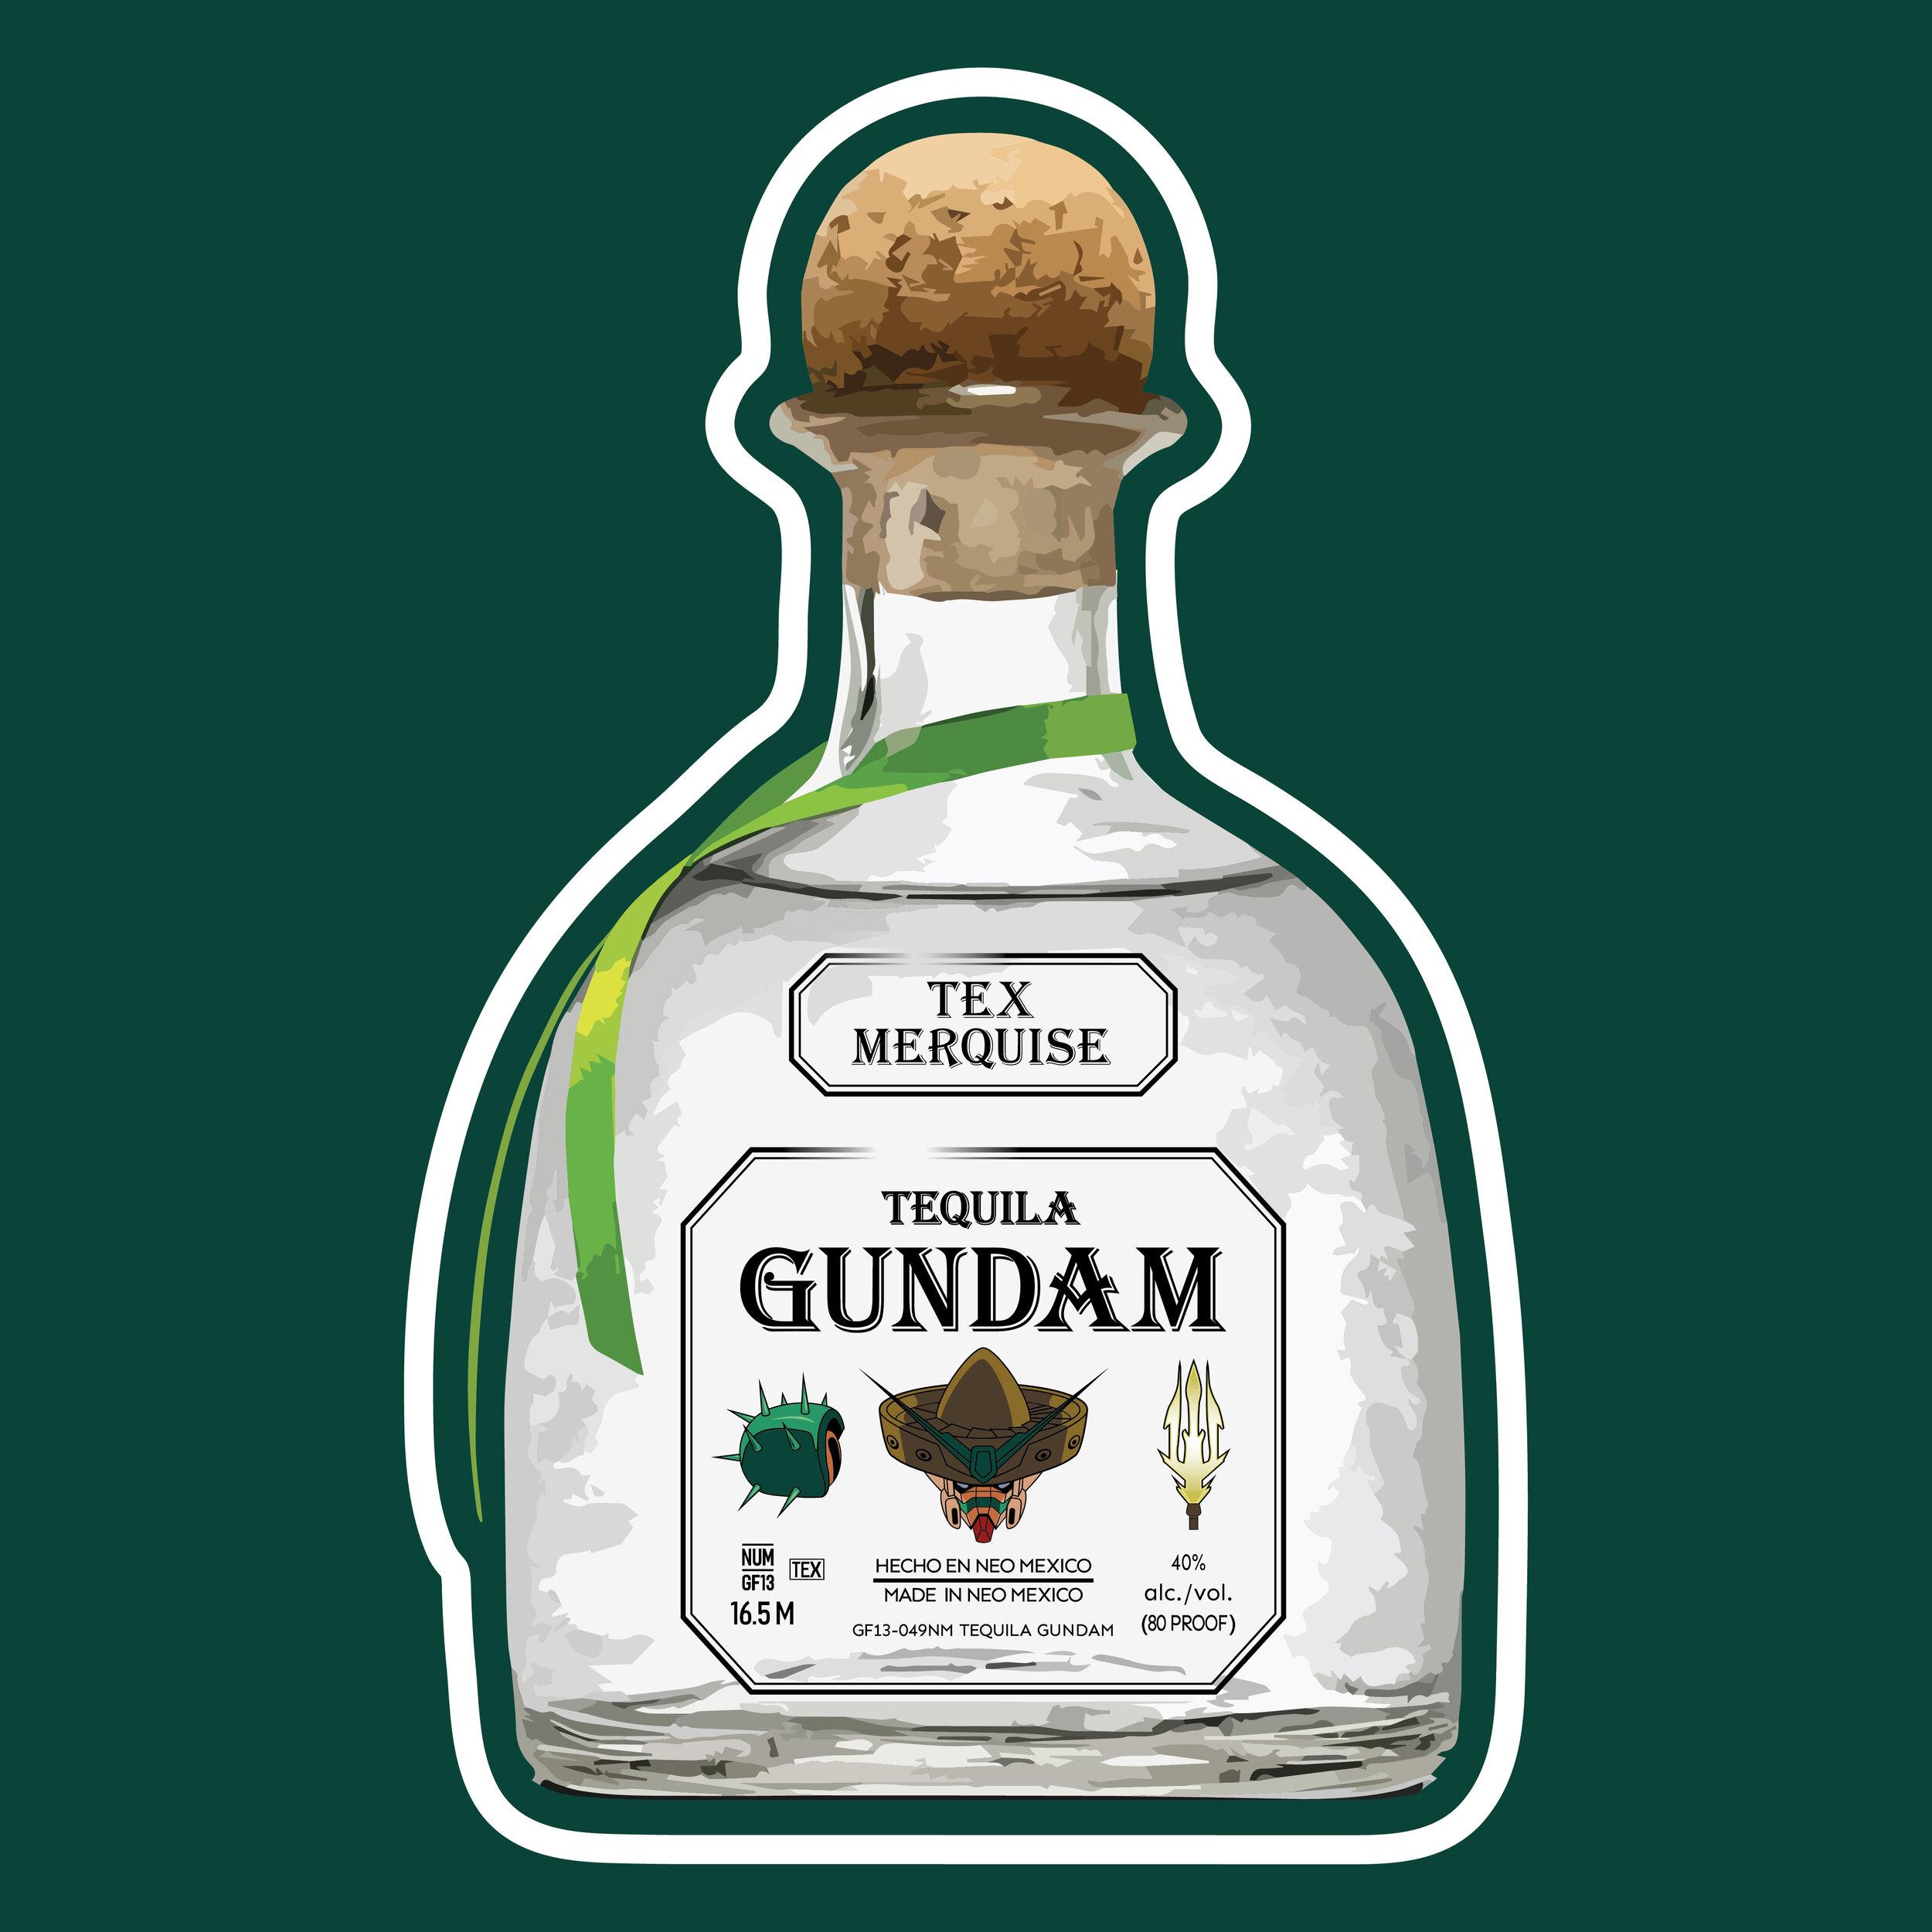 Tex Merquise Tequila Gundam